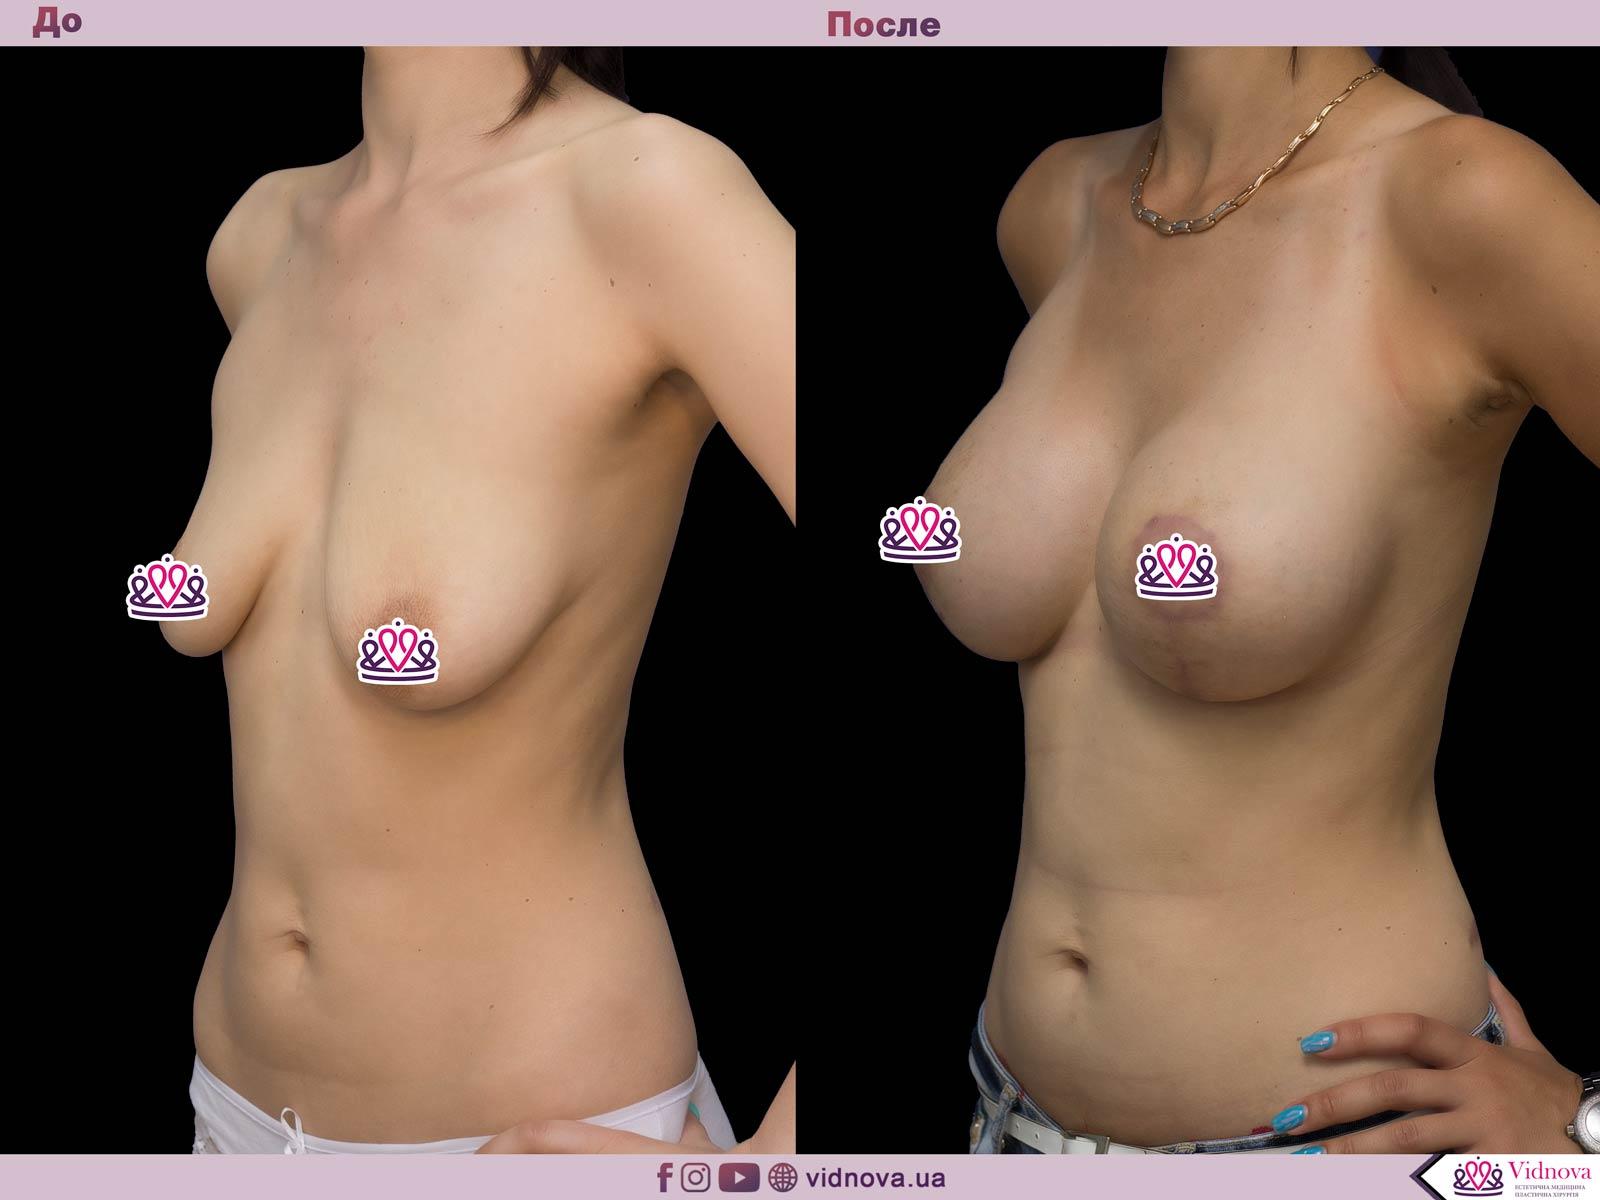 Подтяжка груди: Фото ДО и ПОСЛЕ - Пример №21-2 - Клиника Vidnova